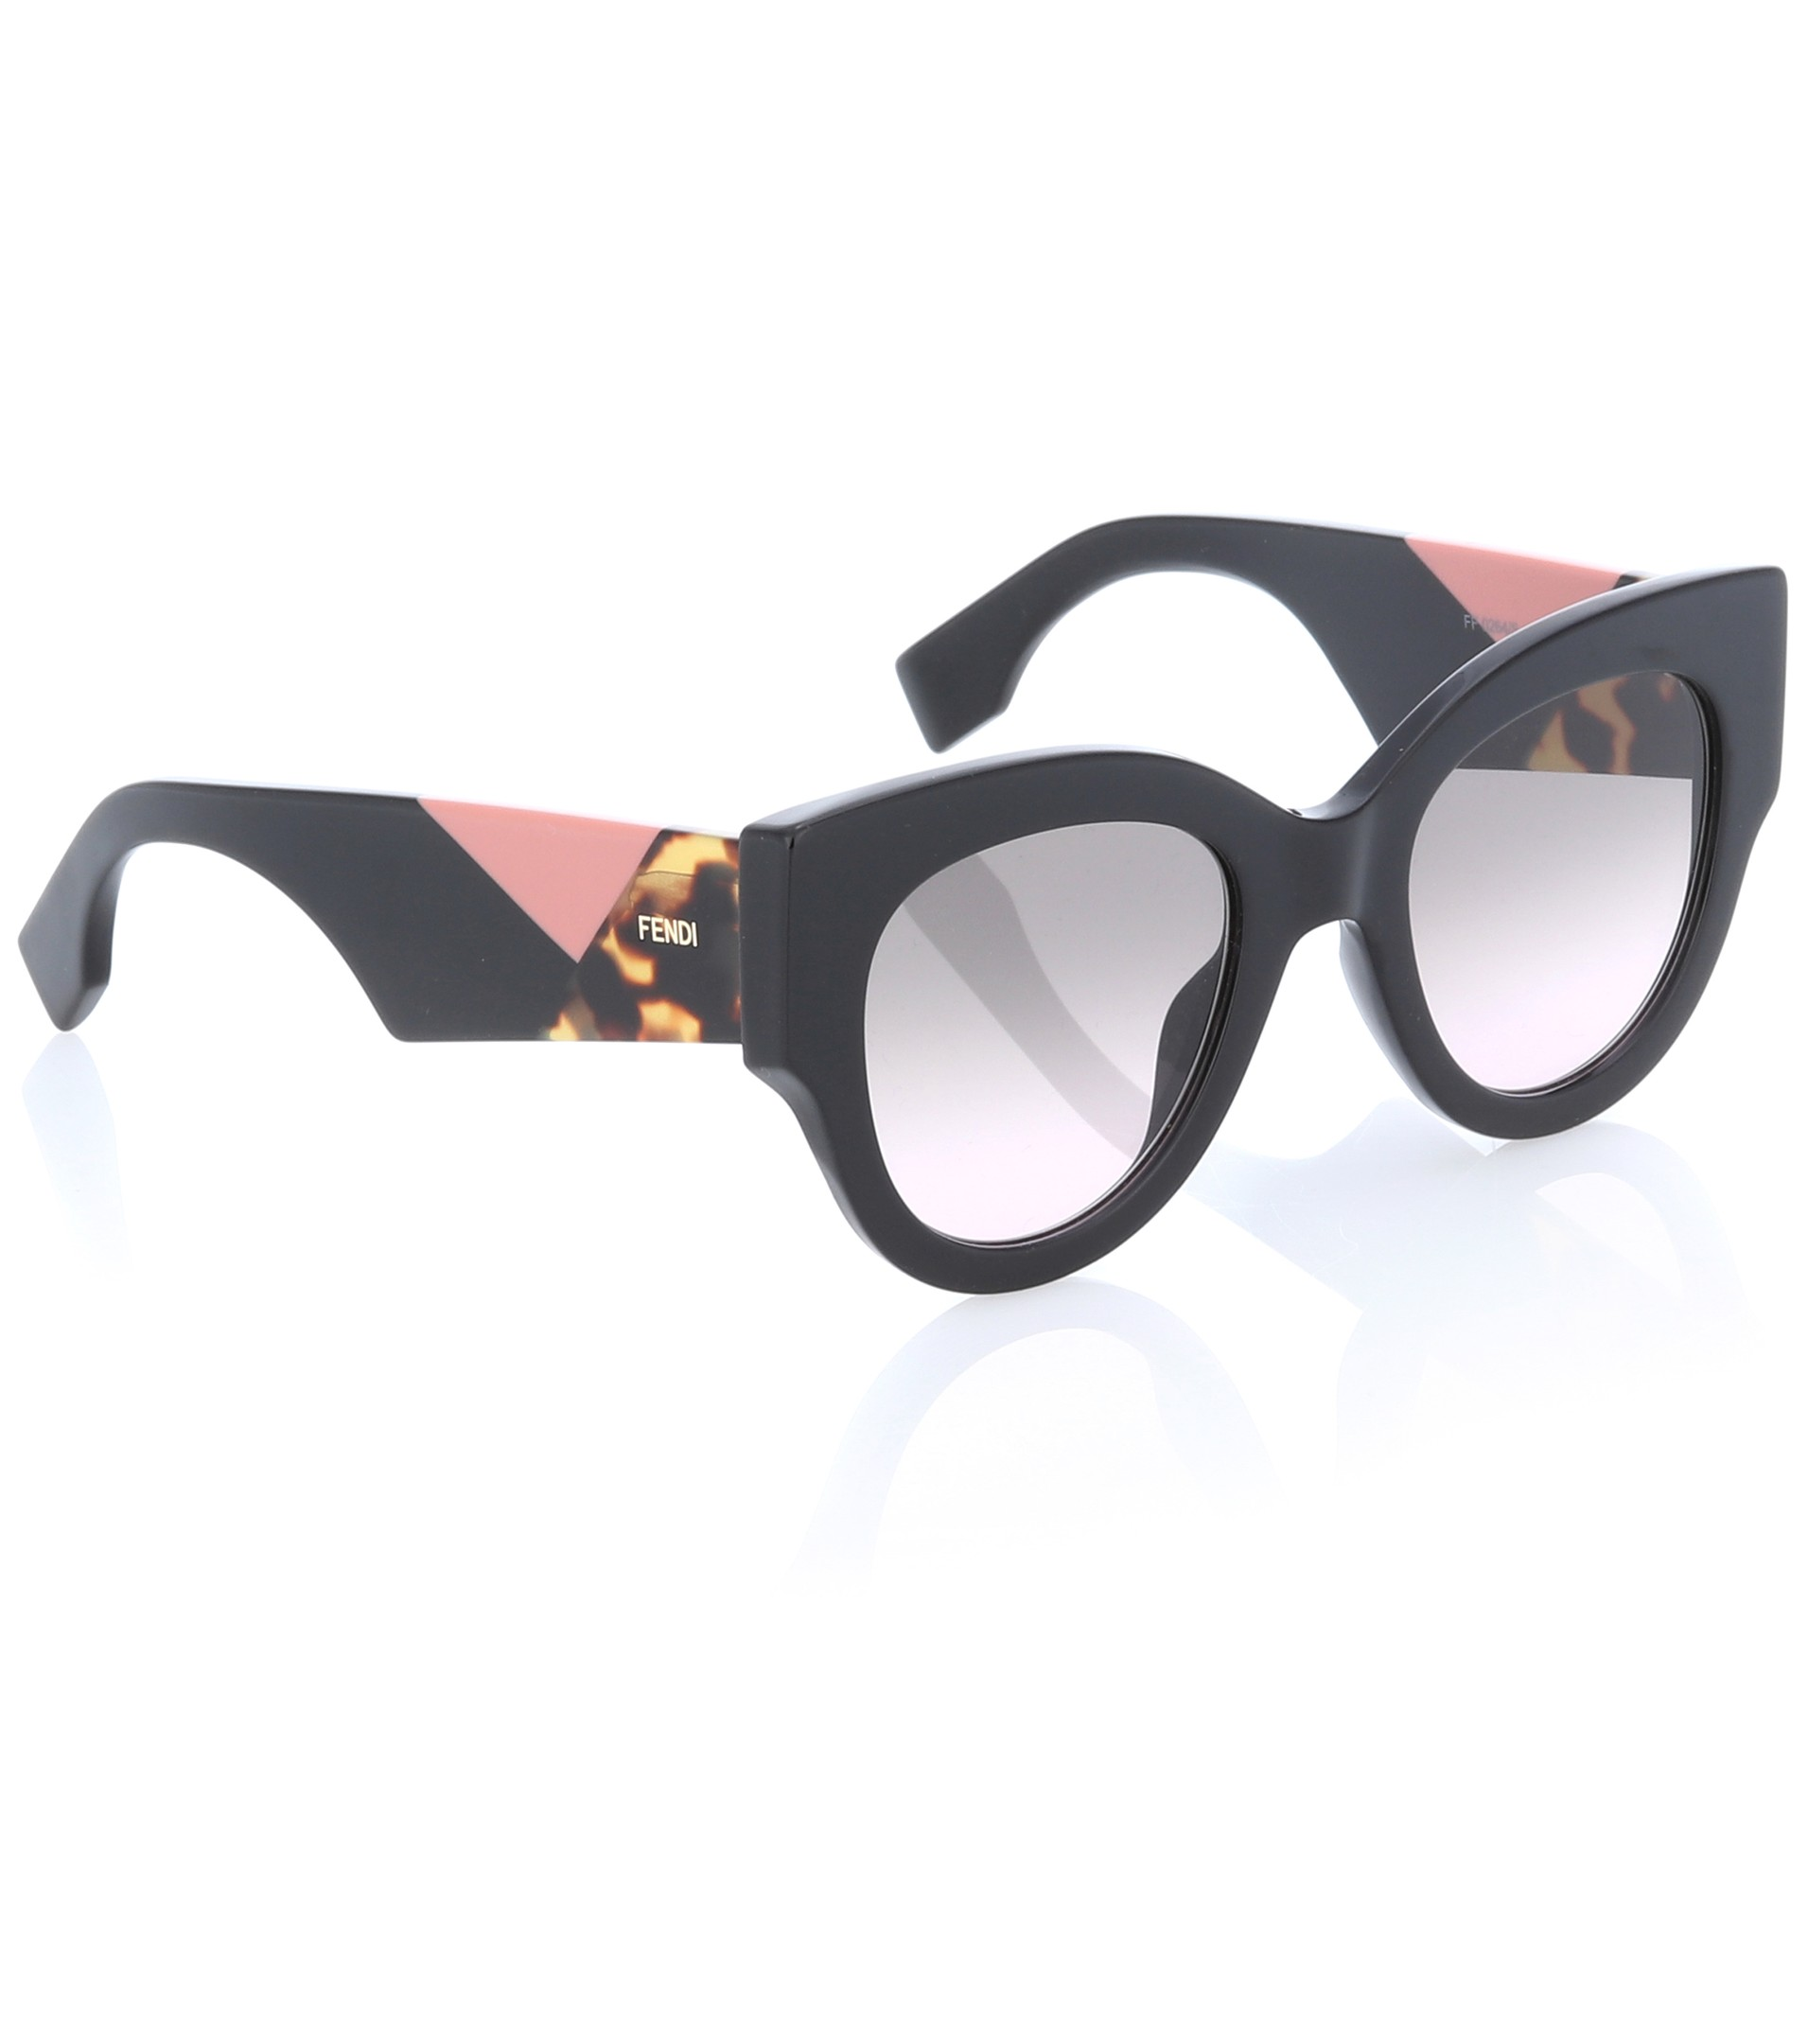 mytheresa.com x Fendi Oversized Round Geometric Sunglasses in Tortoiseshell